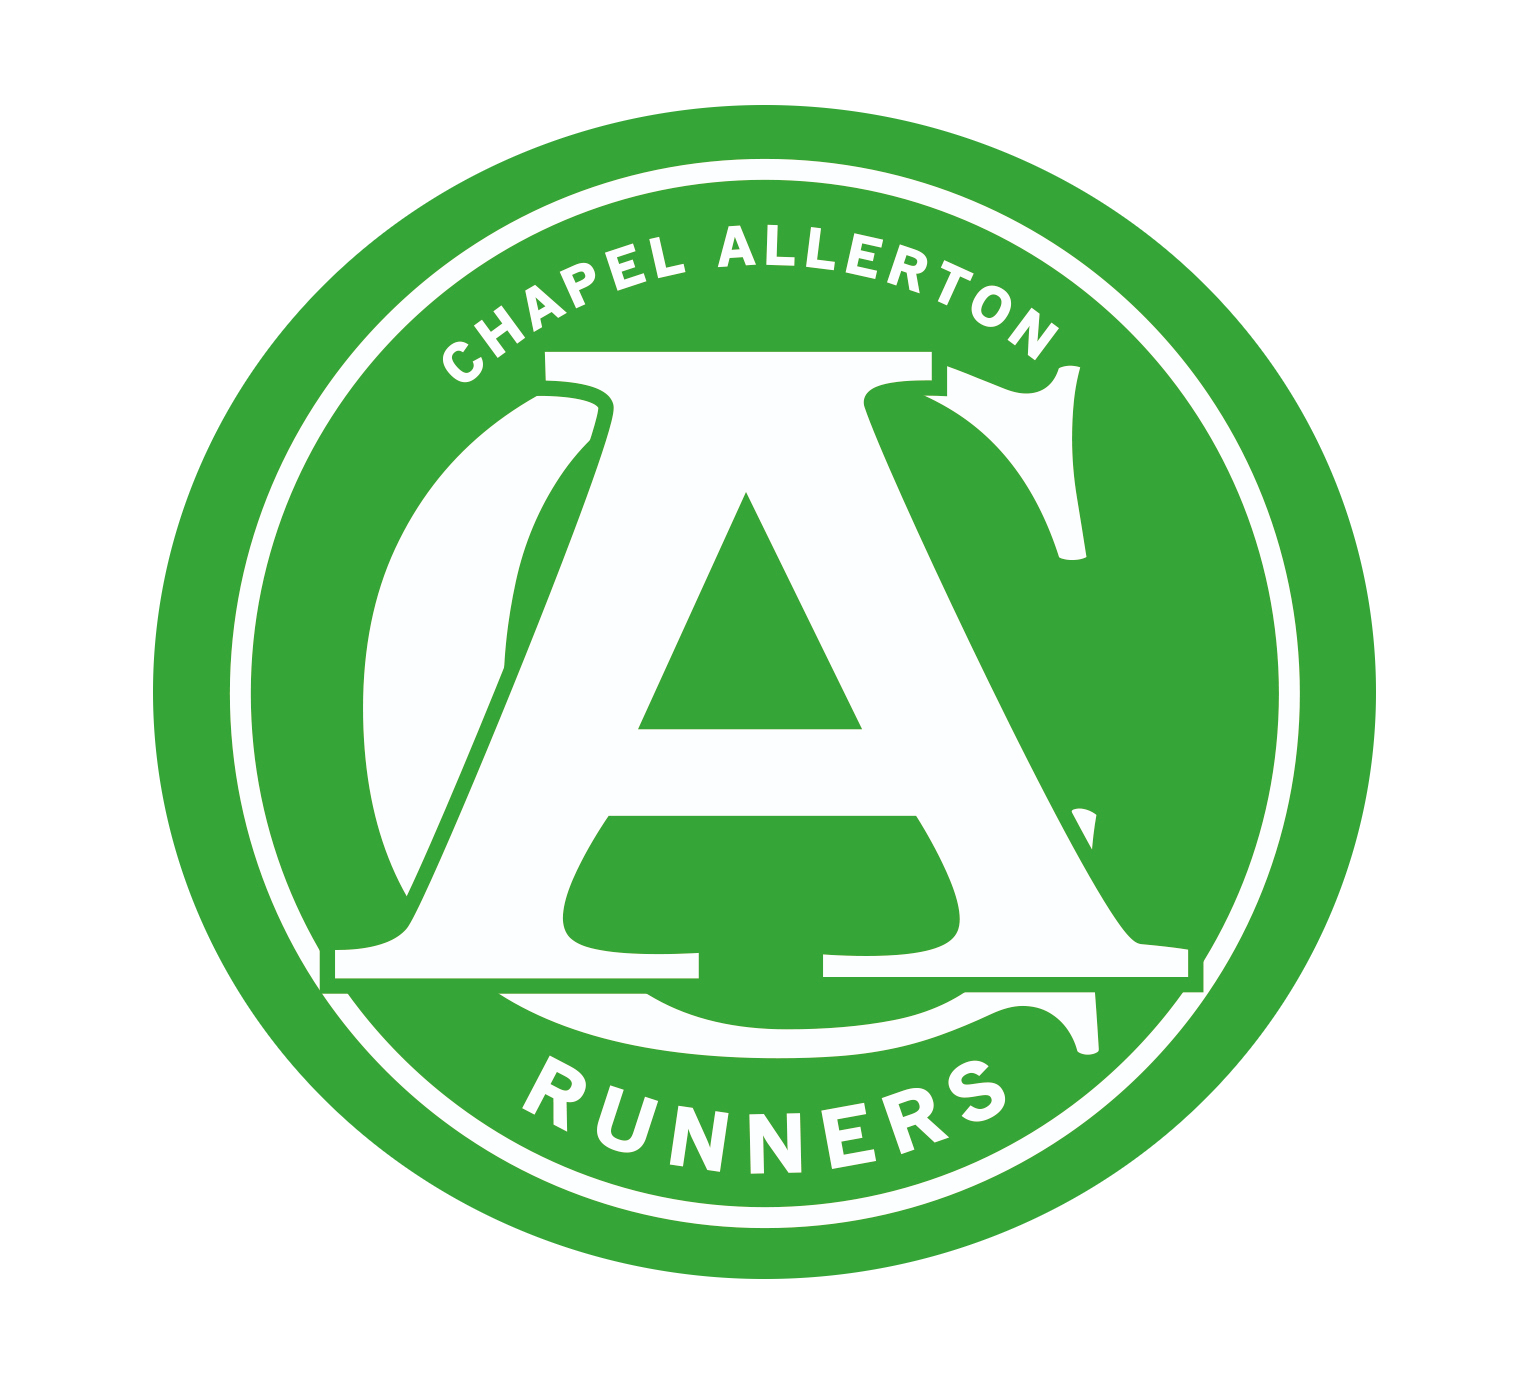 Chapelallertonrunners Logo